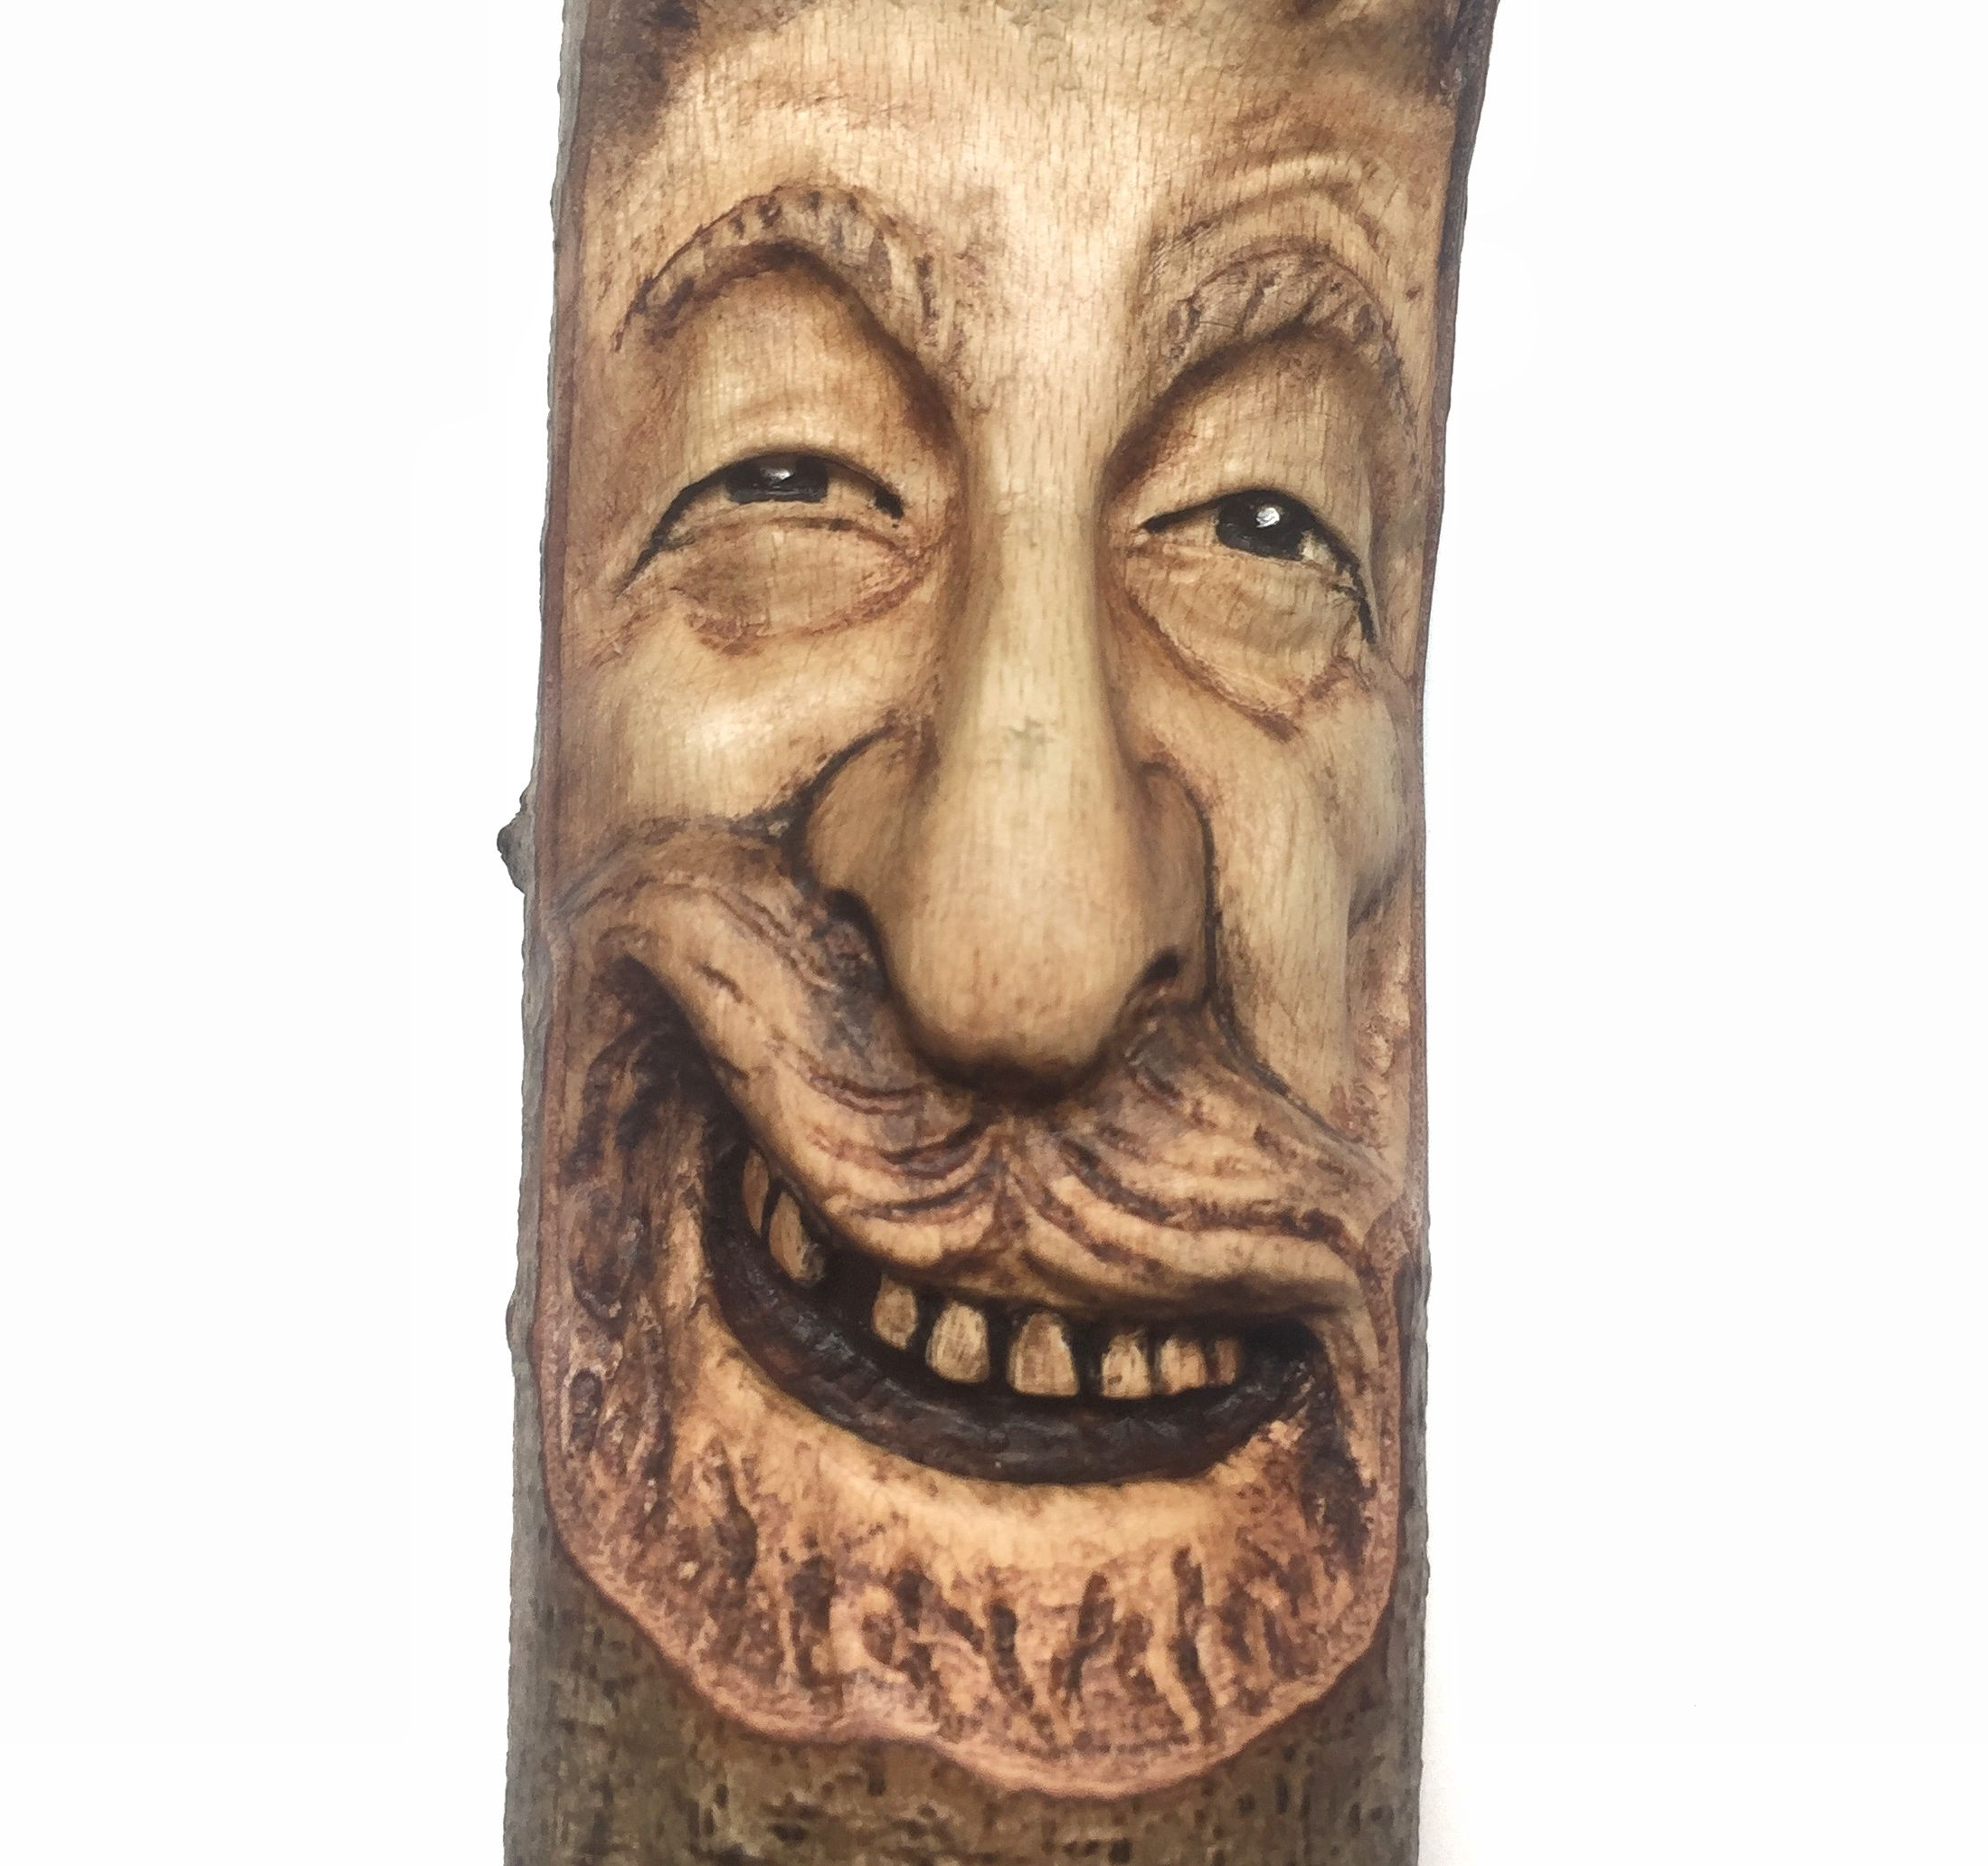 Wood carving by josh carte wood carving josh carte pinterest